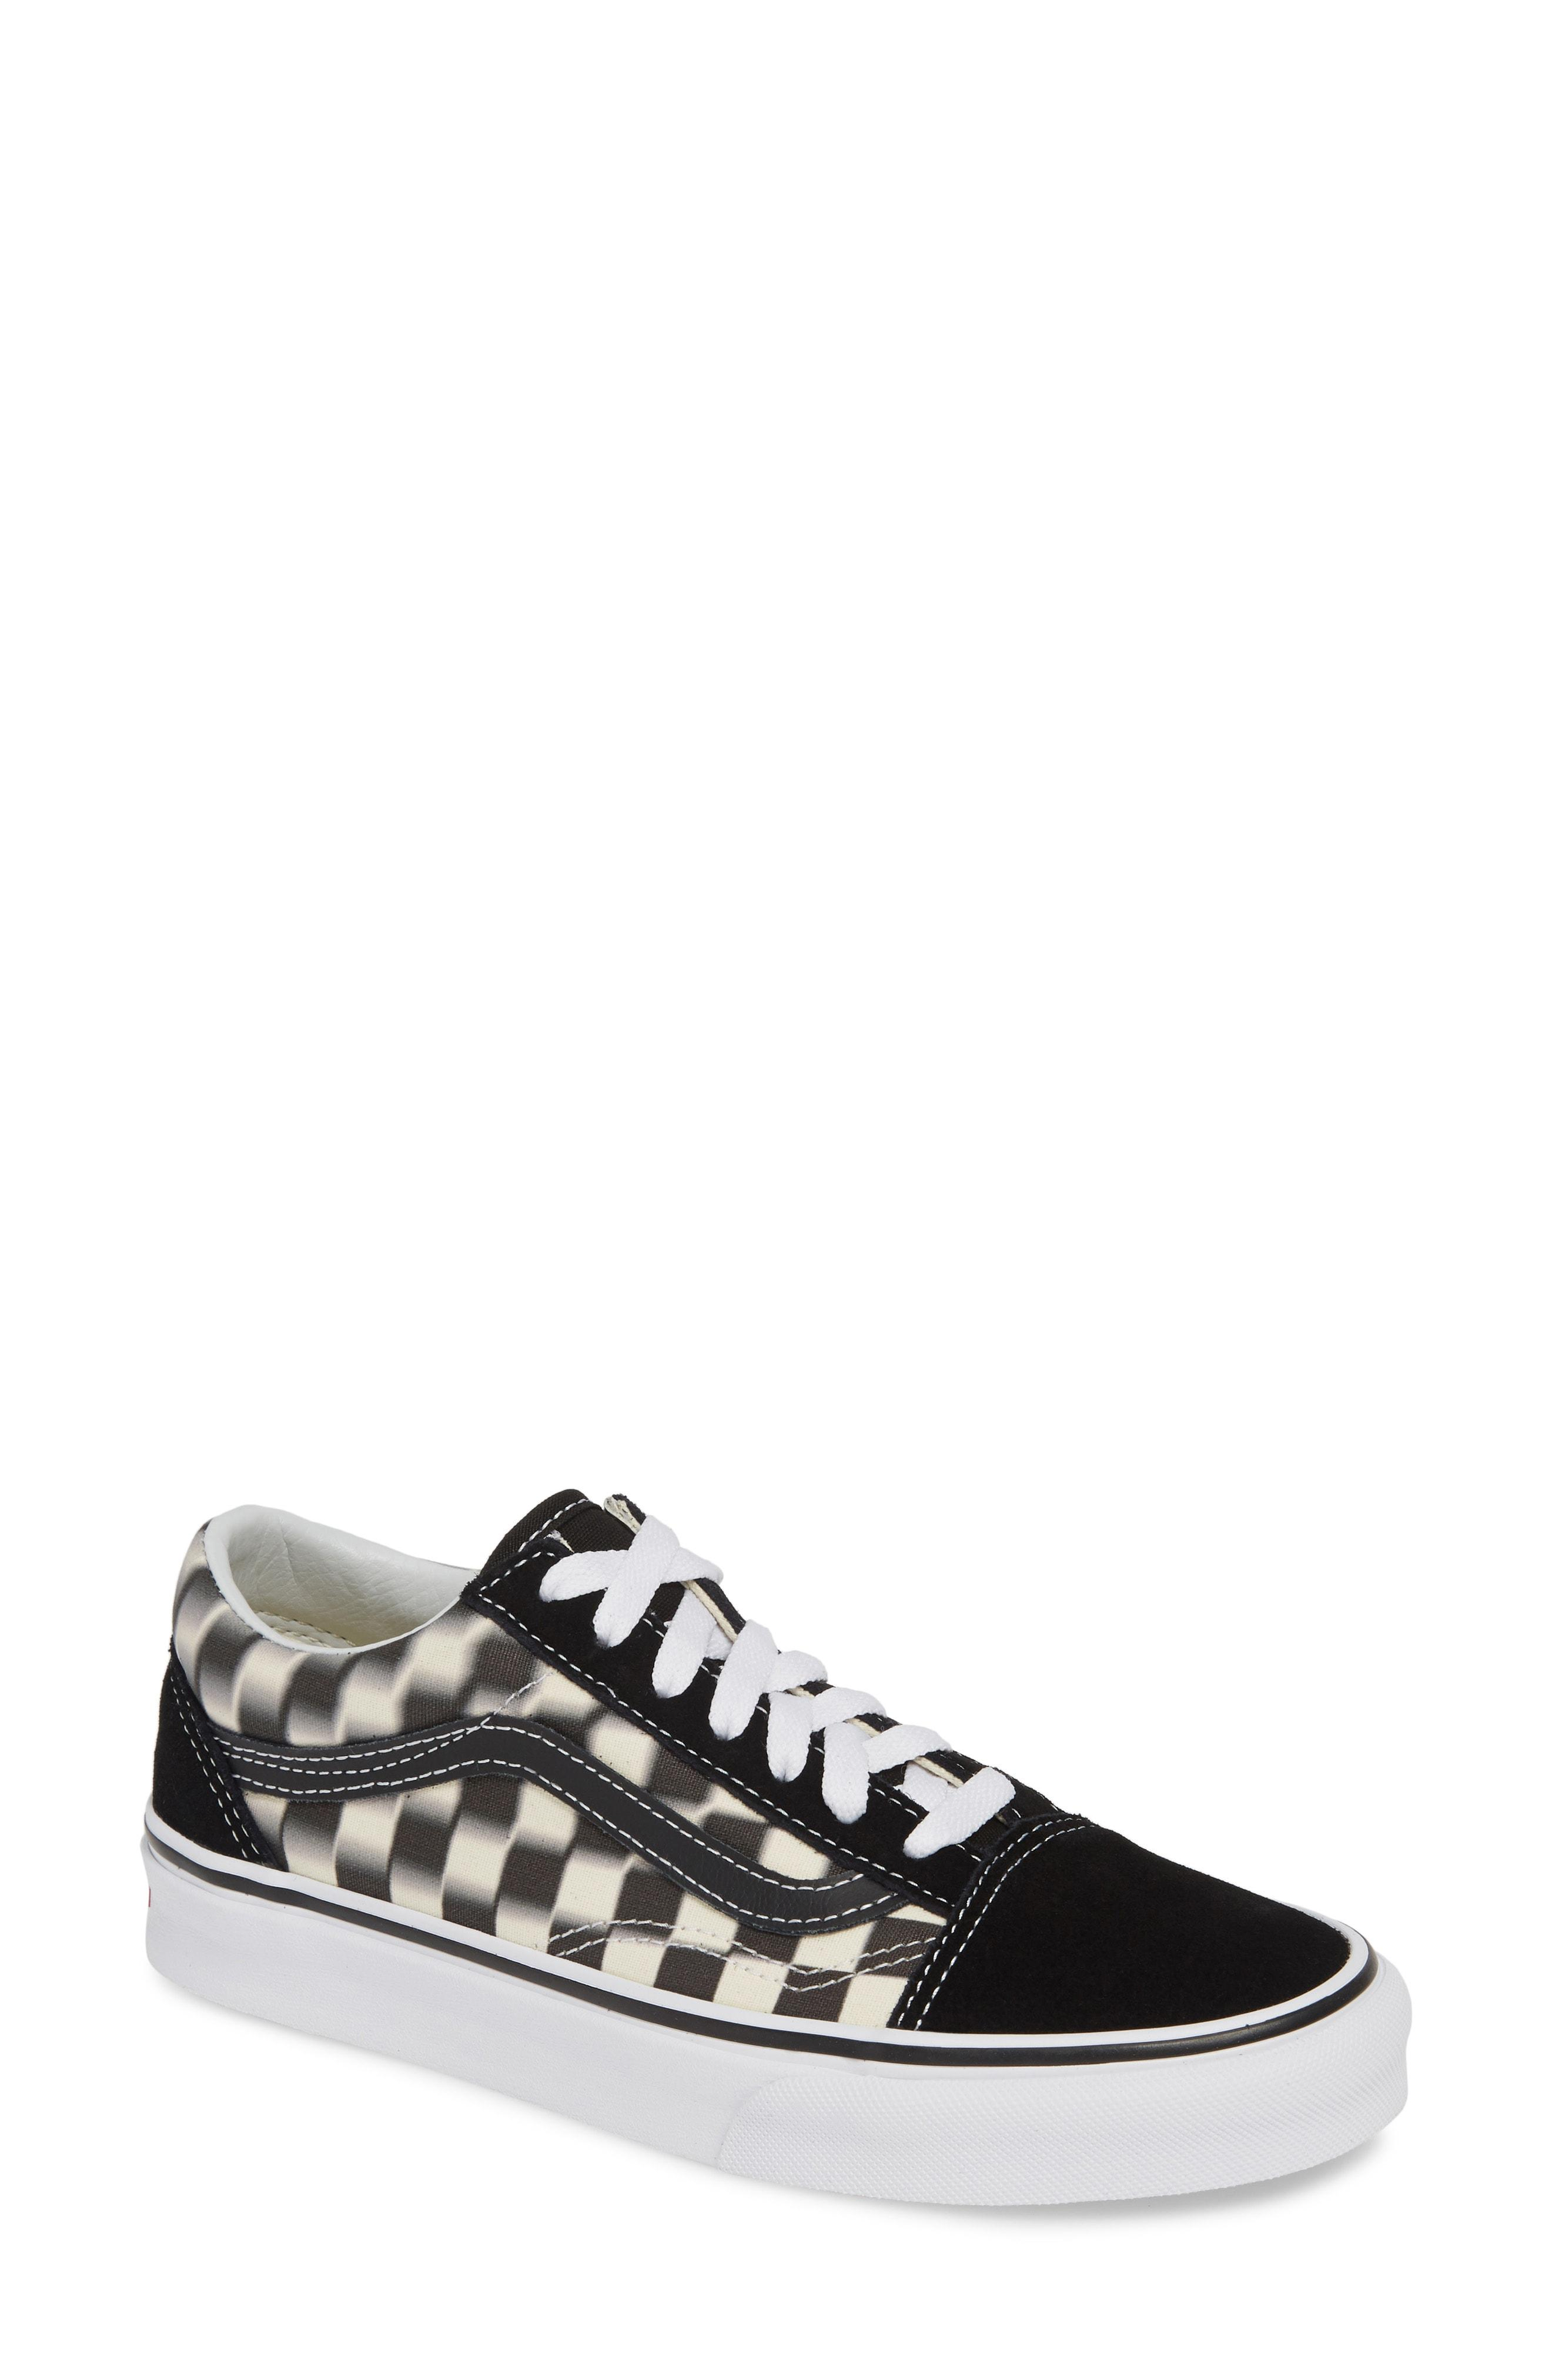 5a41d4c7a3f Lyst - Vans Old Skool Blur Checkerboard Sneaker in Black